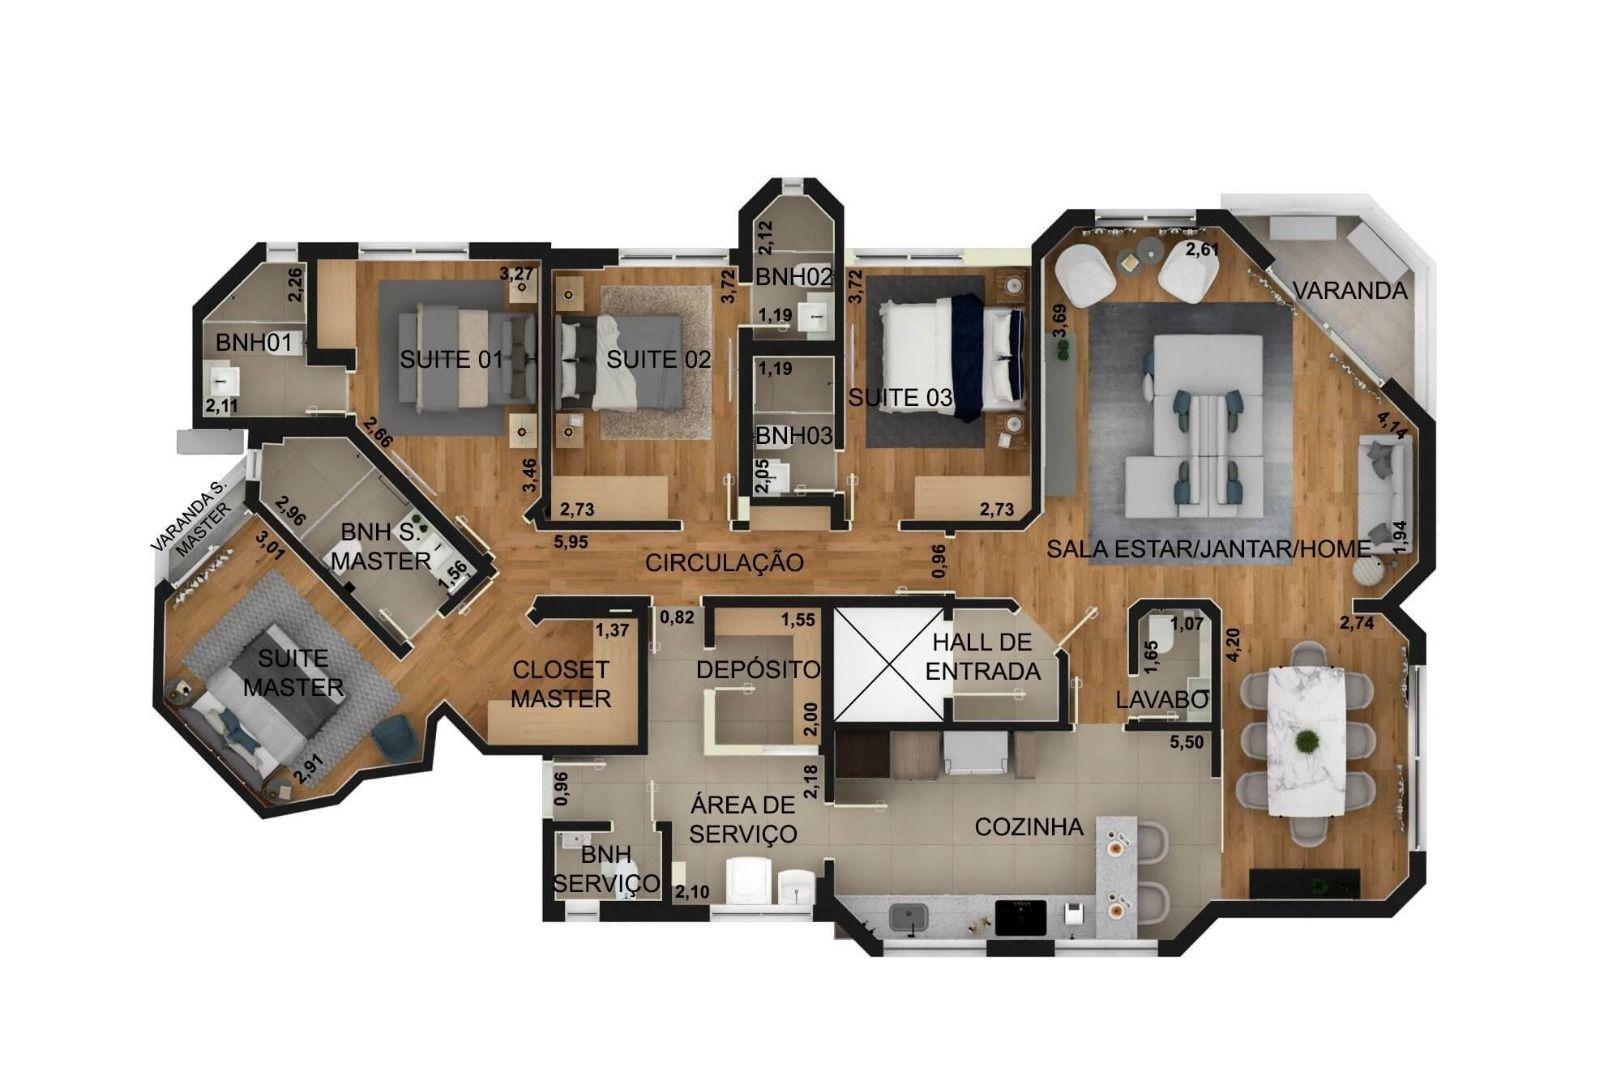 155 M² - 4 SUÍTES. (Apartamento 41, 4º andar).